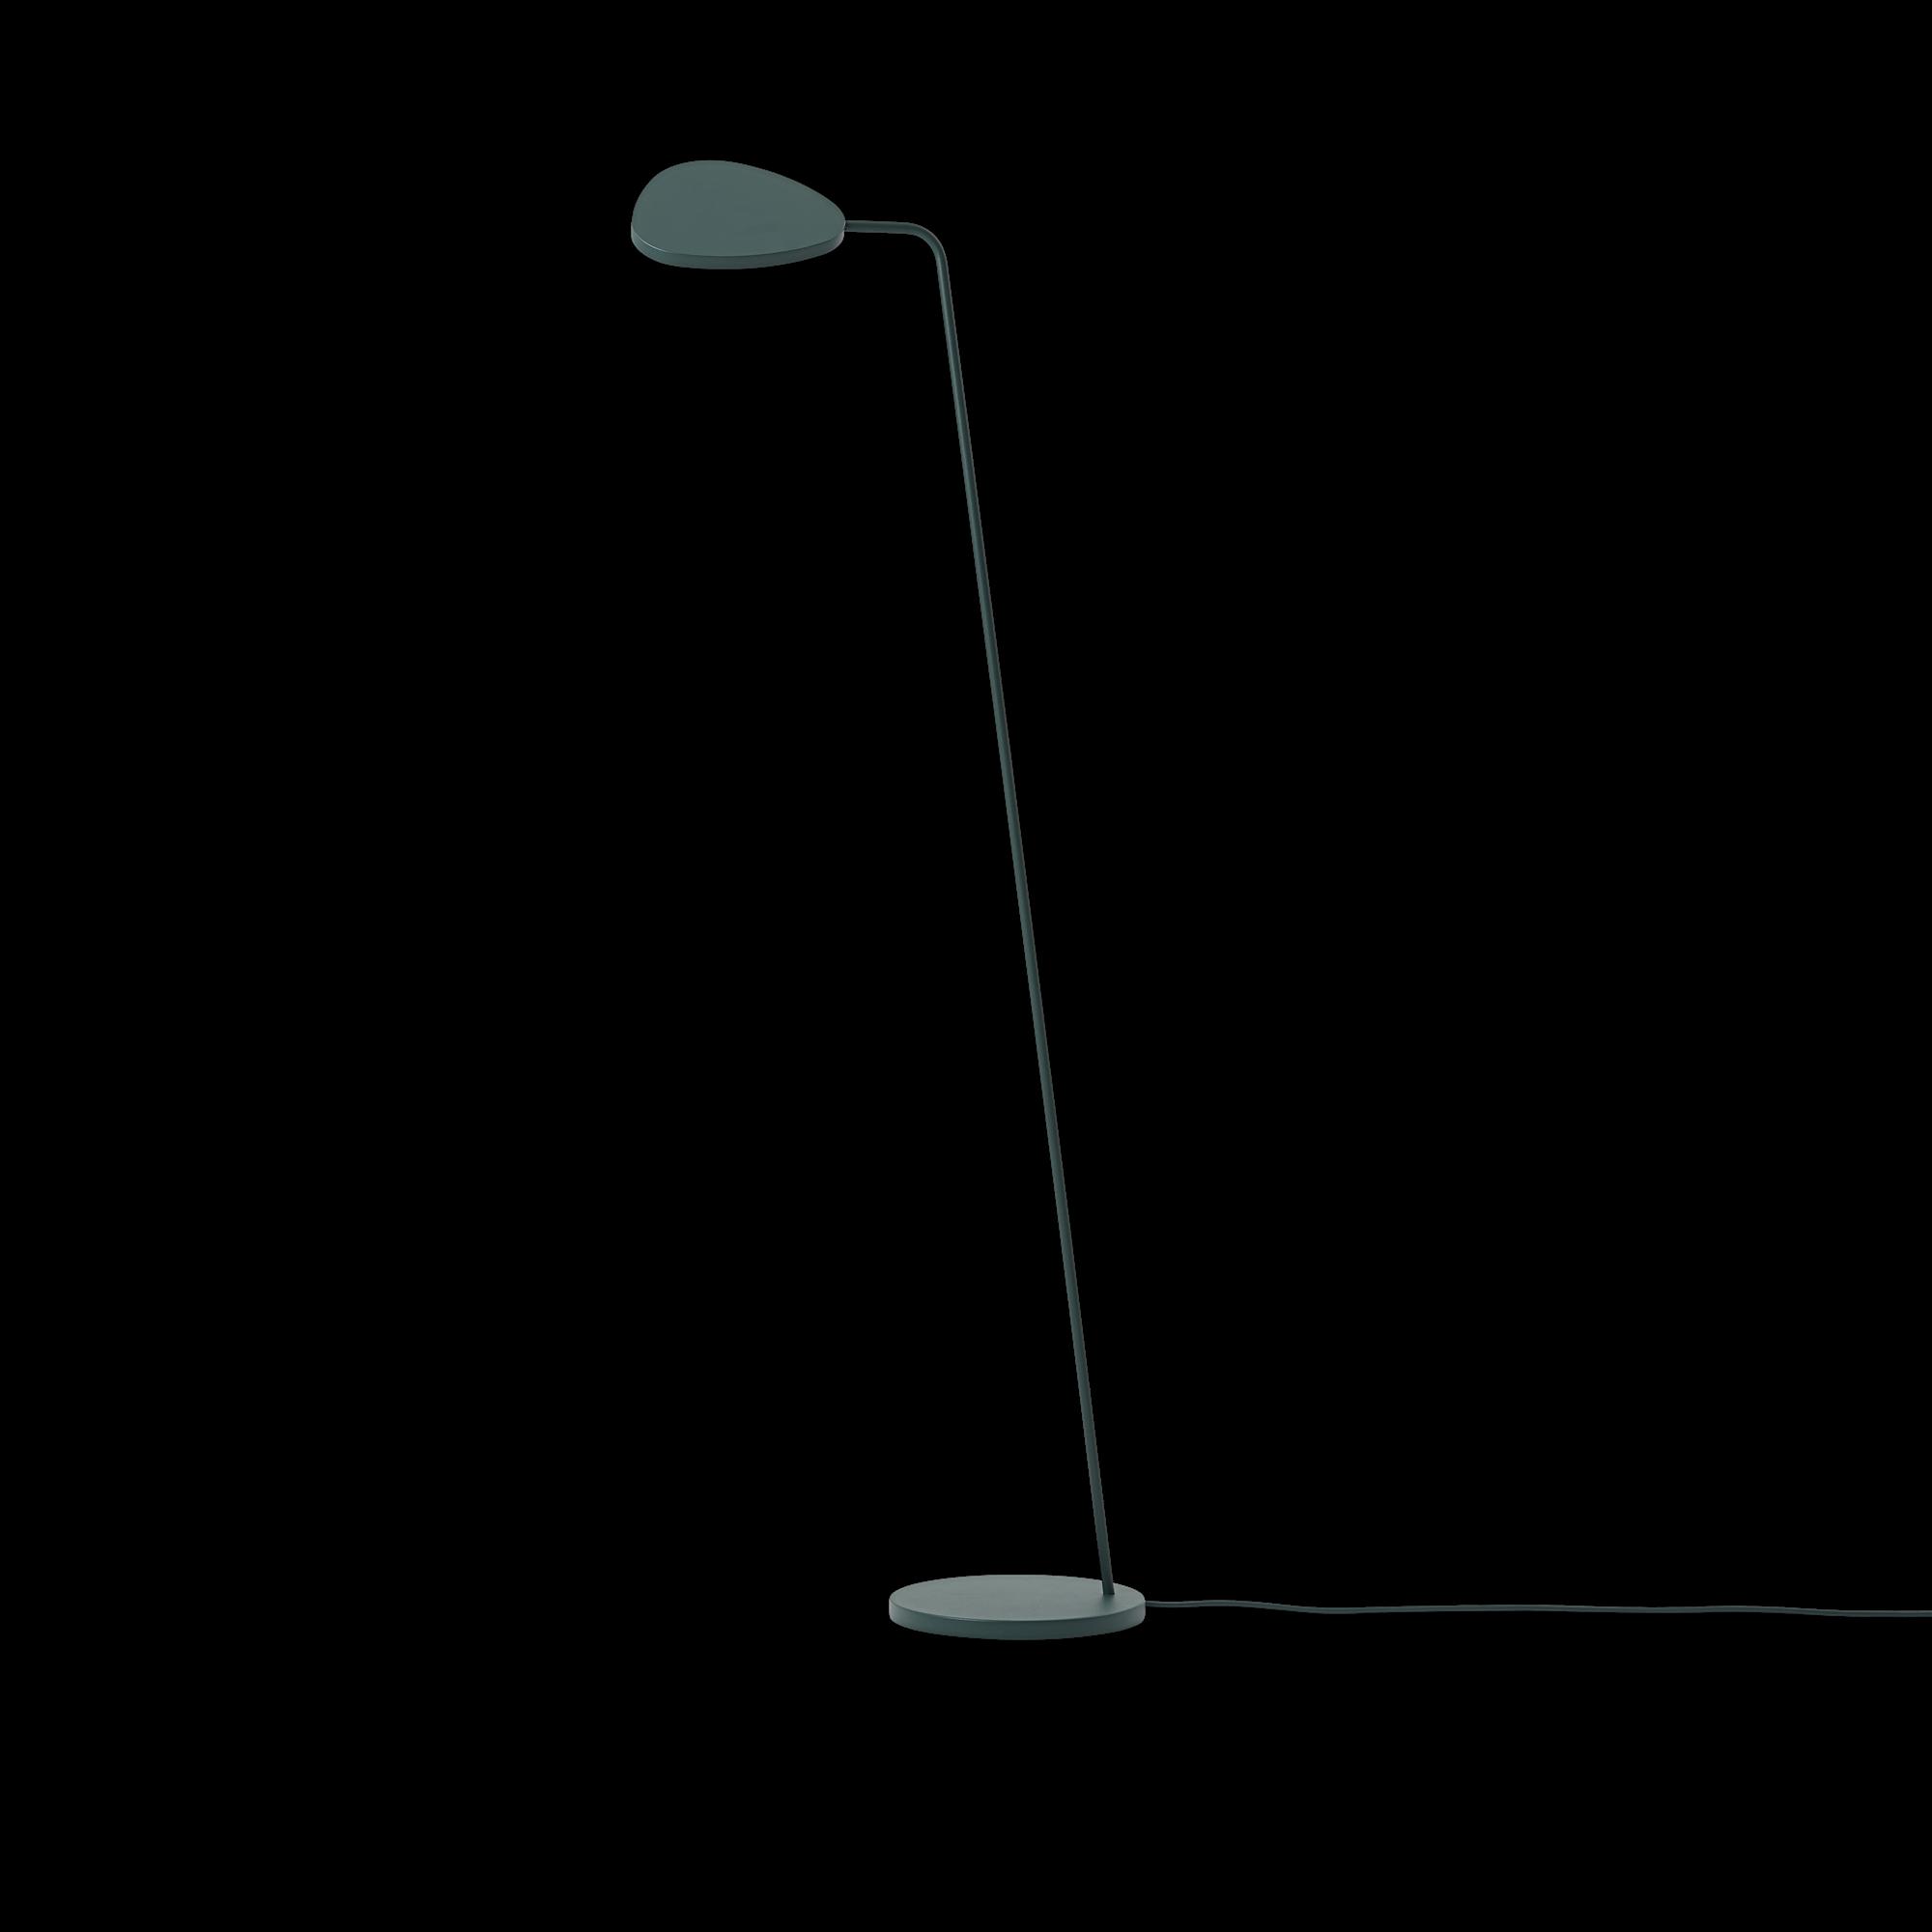 Pin By Ceciel Konings On Lampen In 2020 Floor Lamp Lamp Scandinavian Lighting